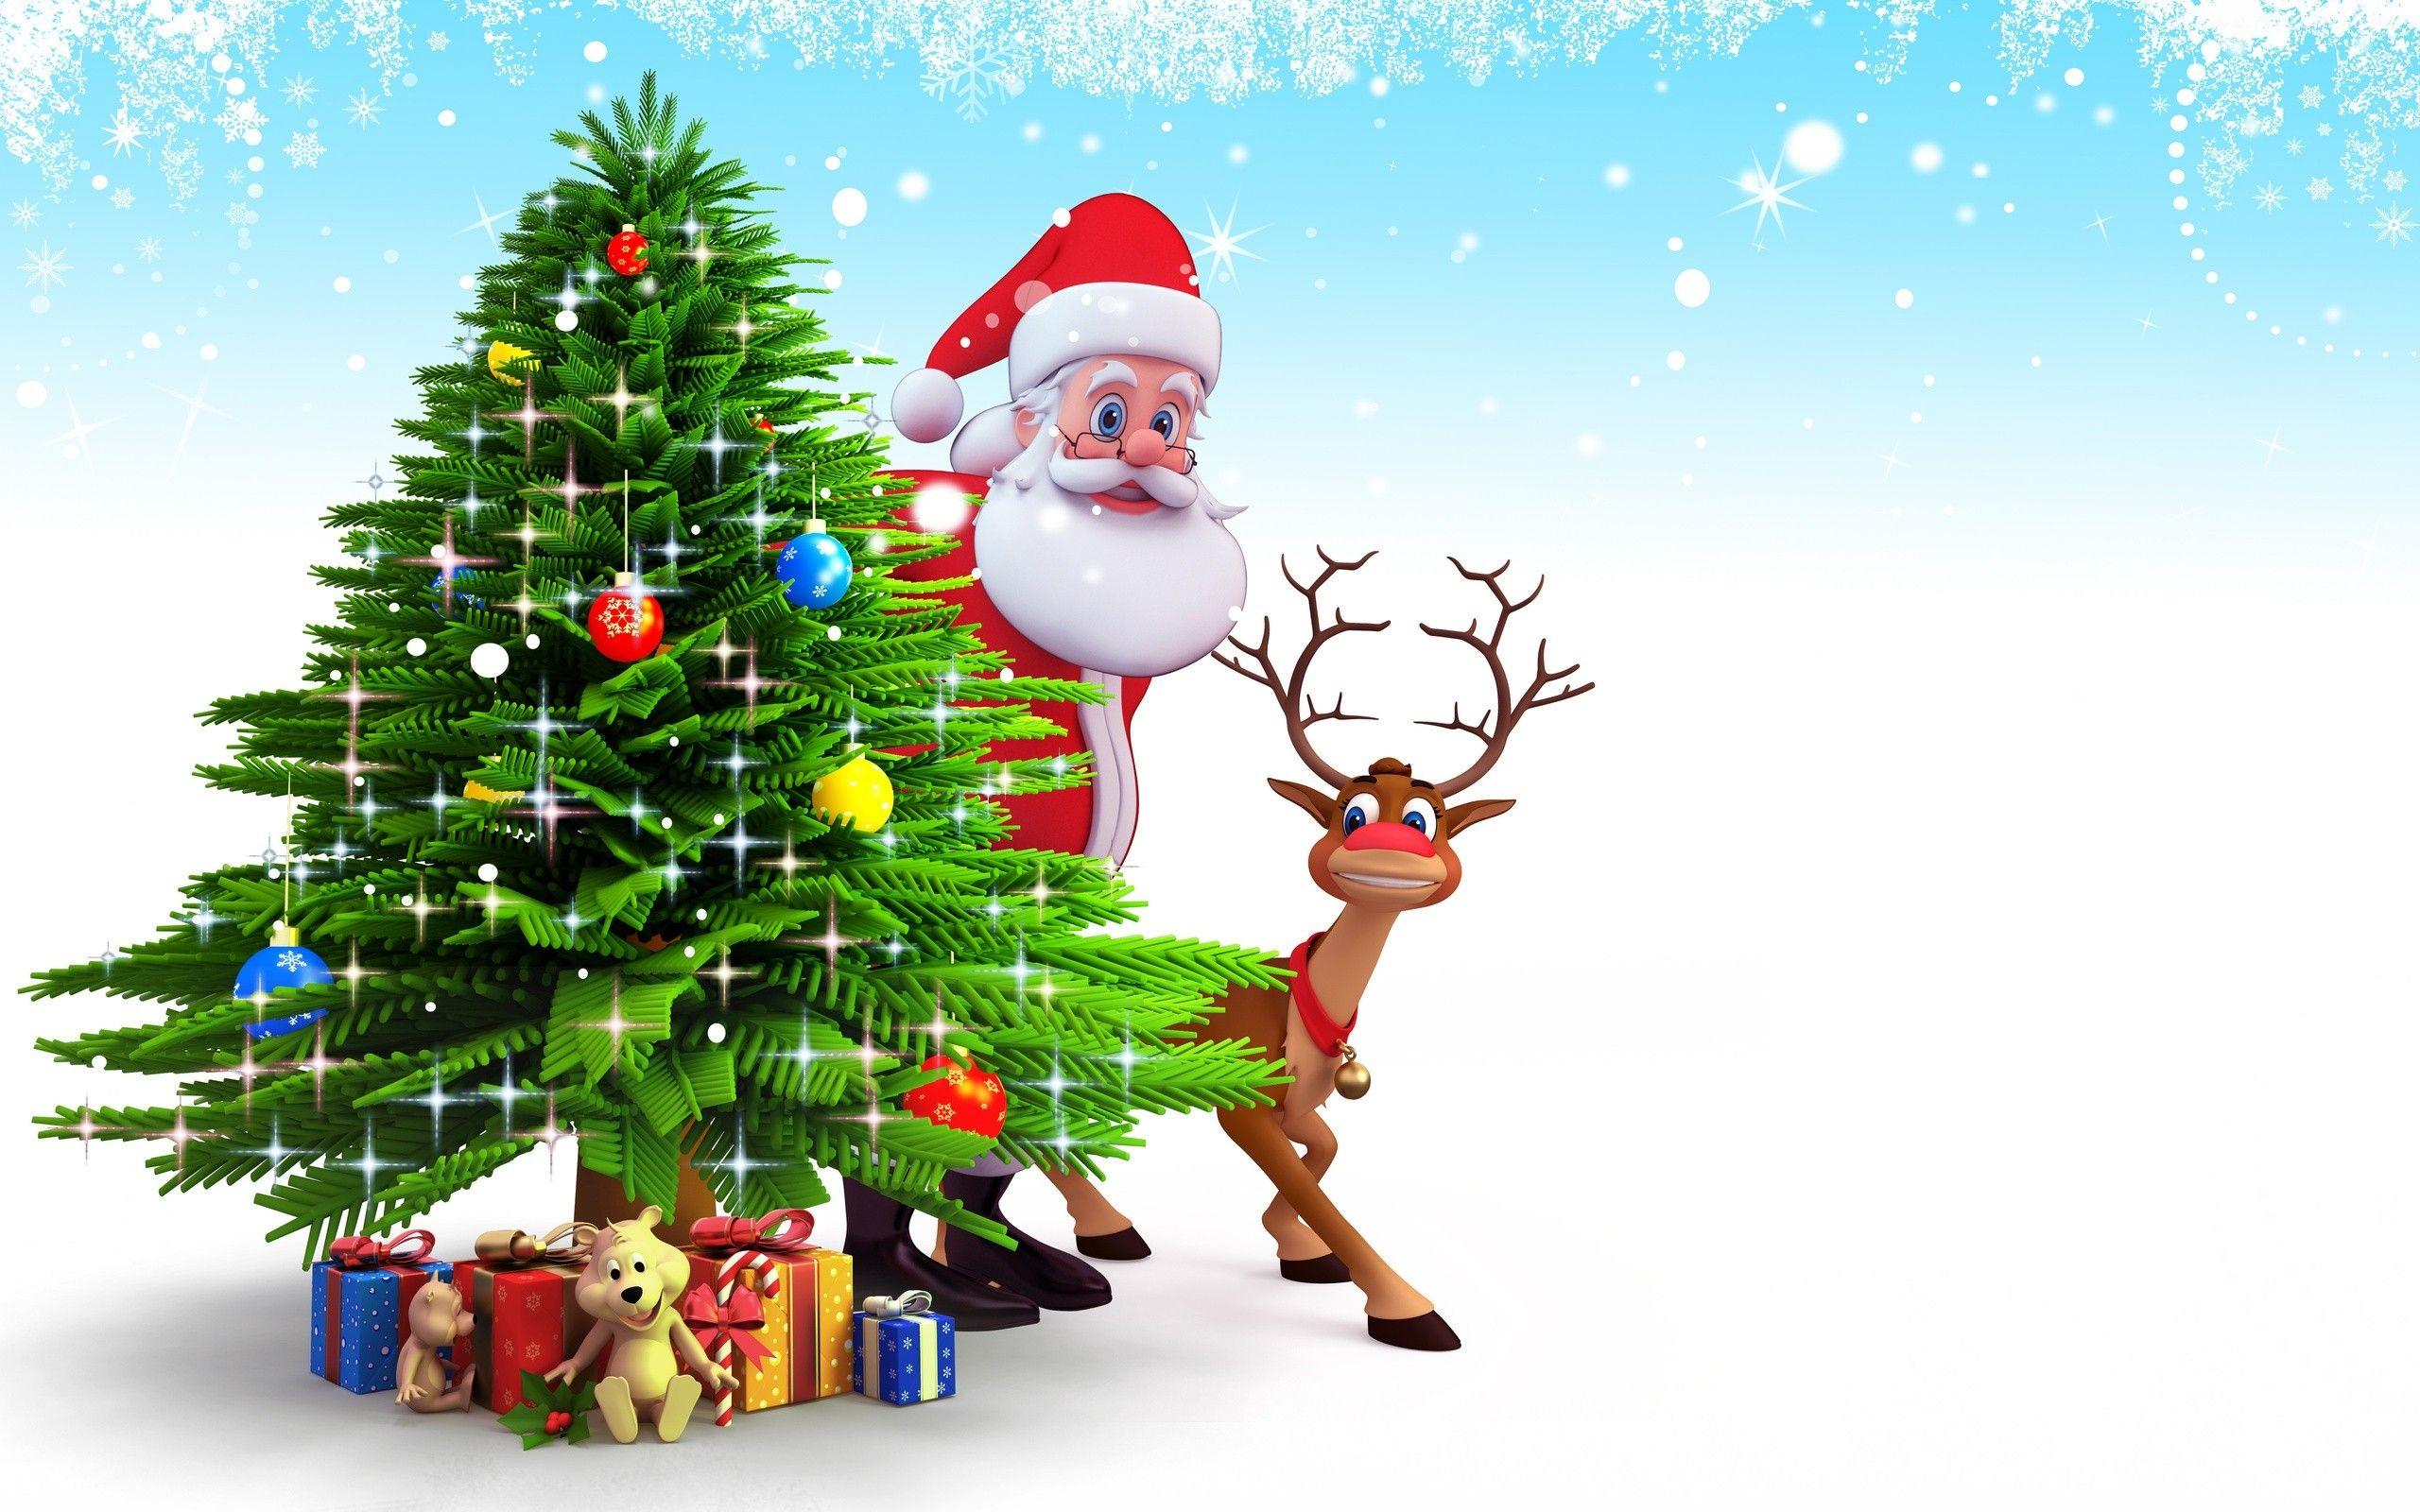 Choinka, Mikołaj, Prezenty, Renifer | Christmas pictures, Christmas cover, Merry christmas background